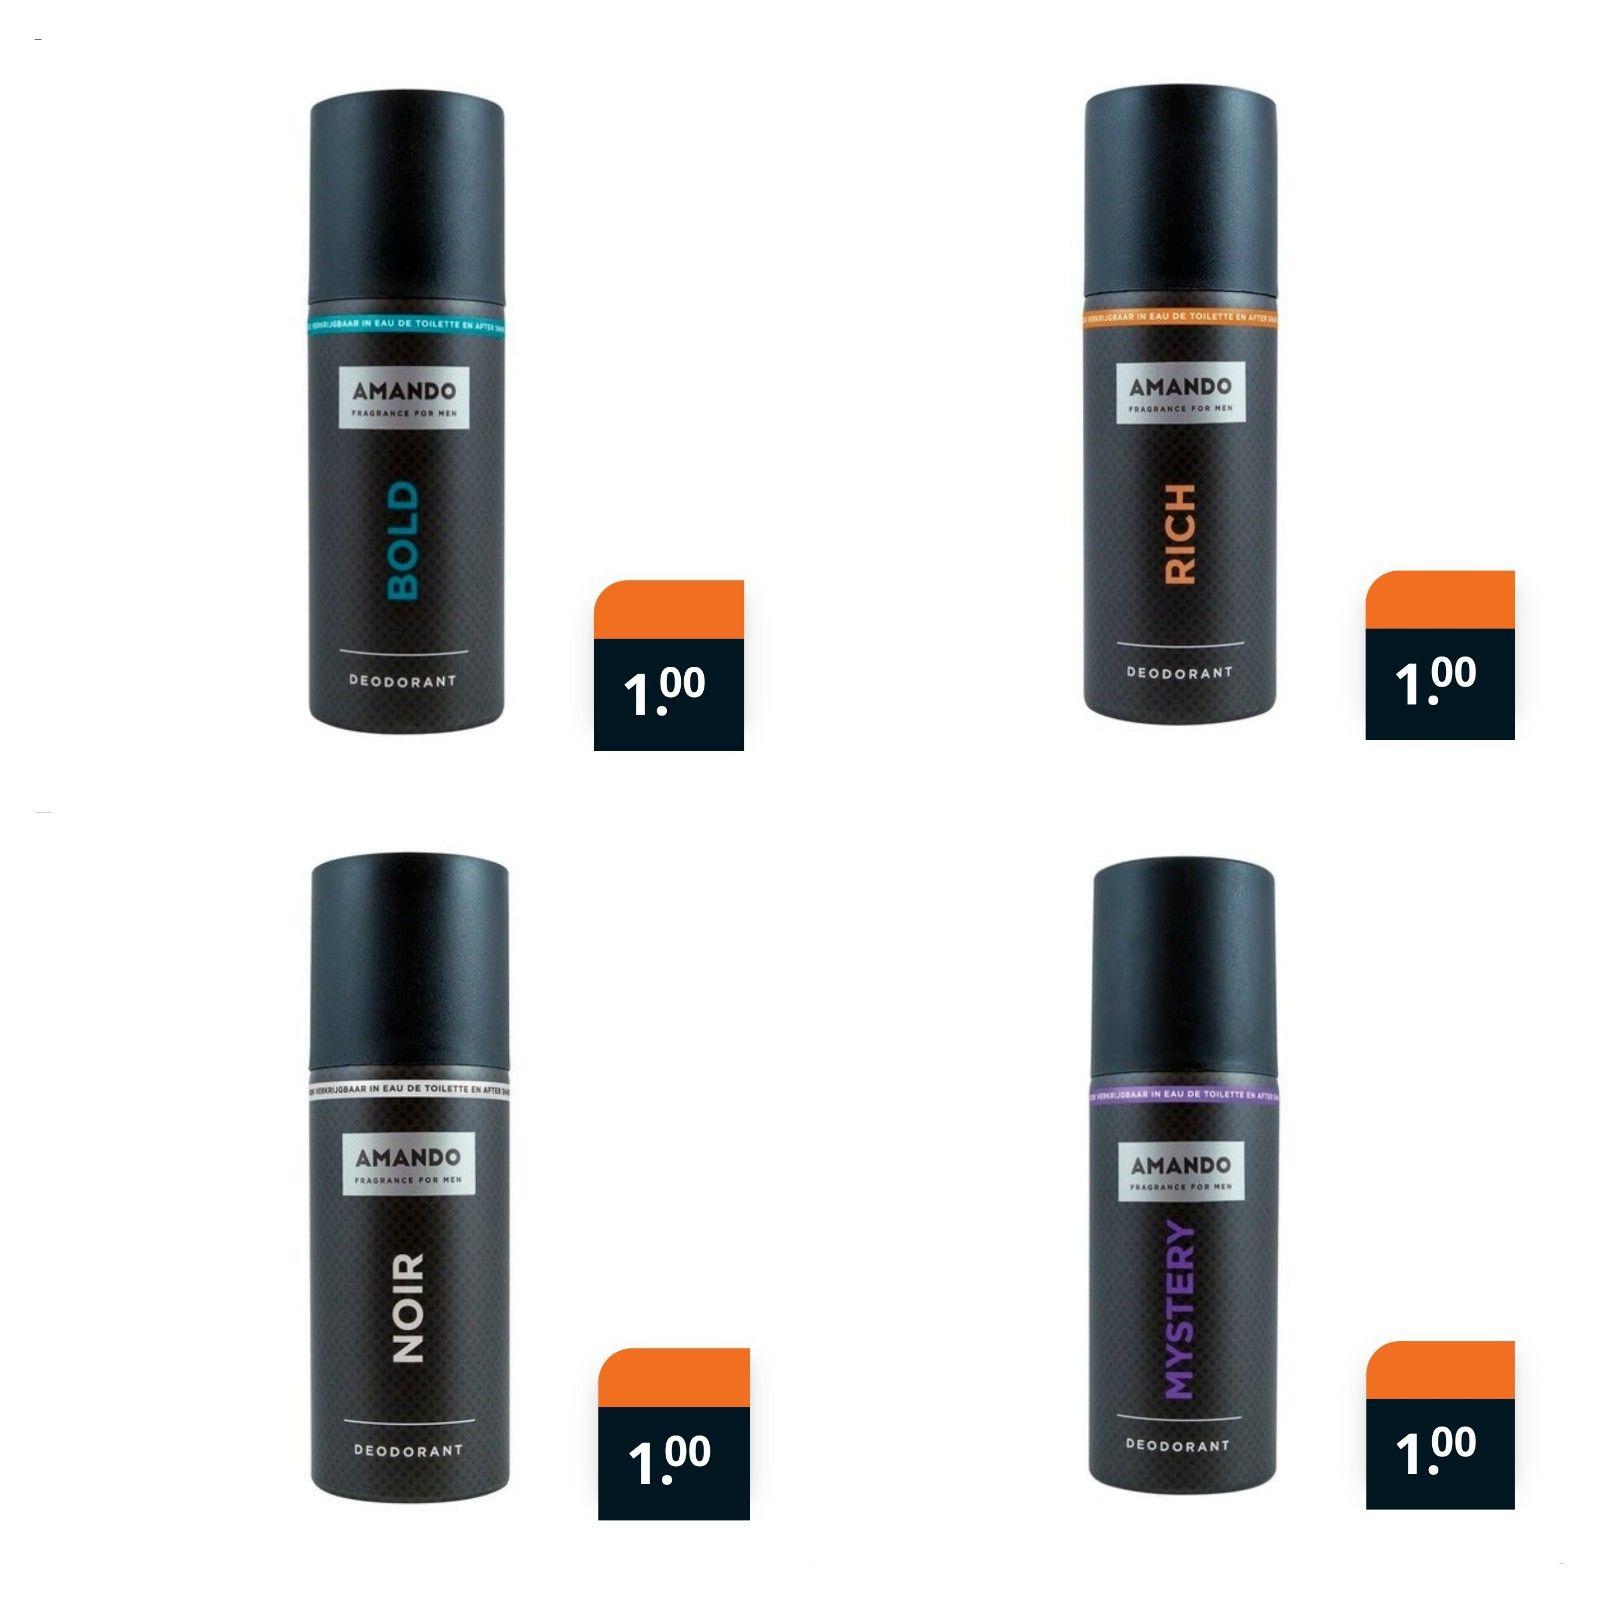 Amando deodorant €1 @Trekpleister